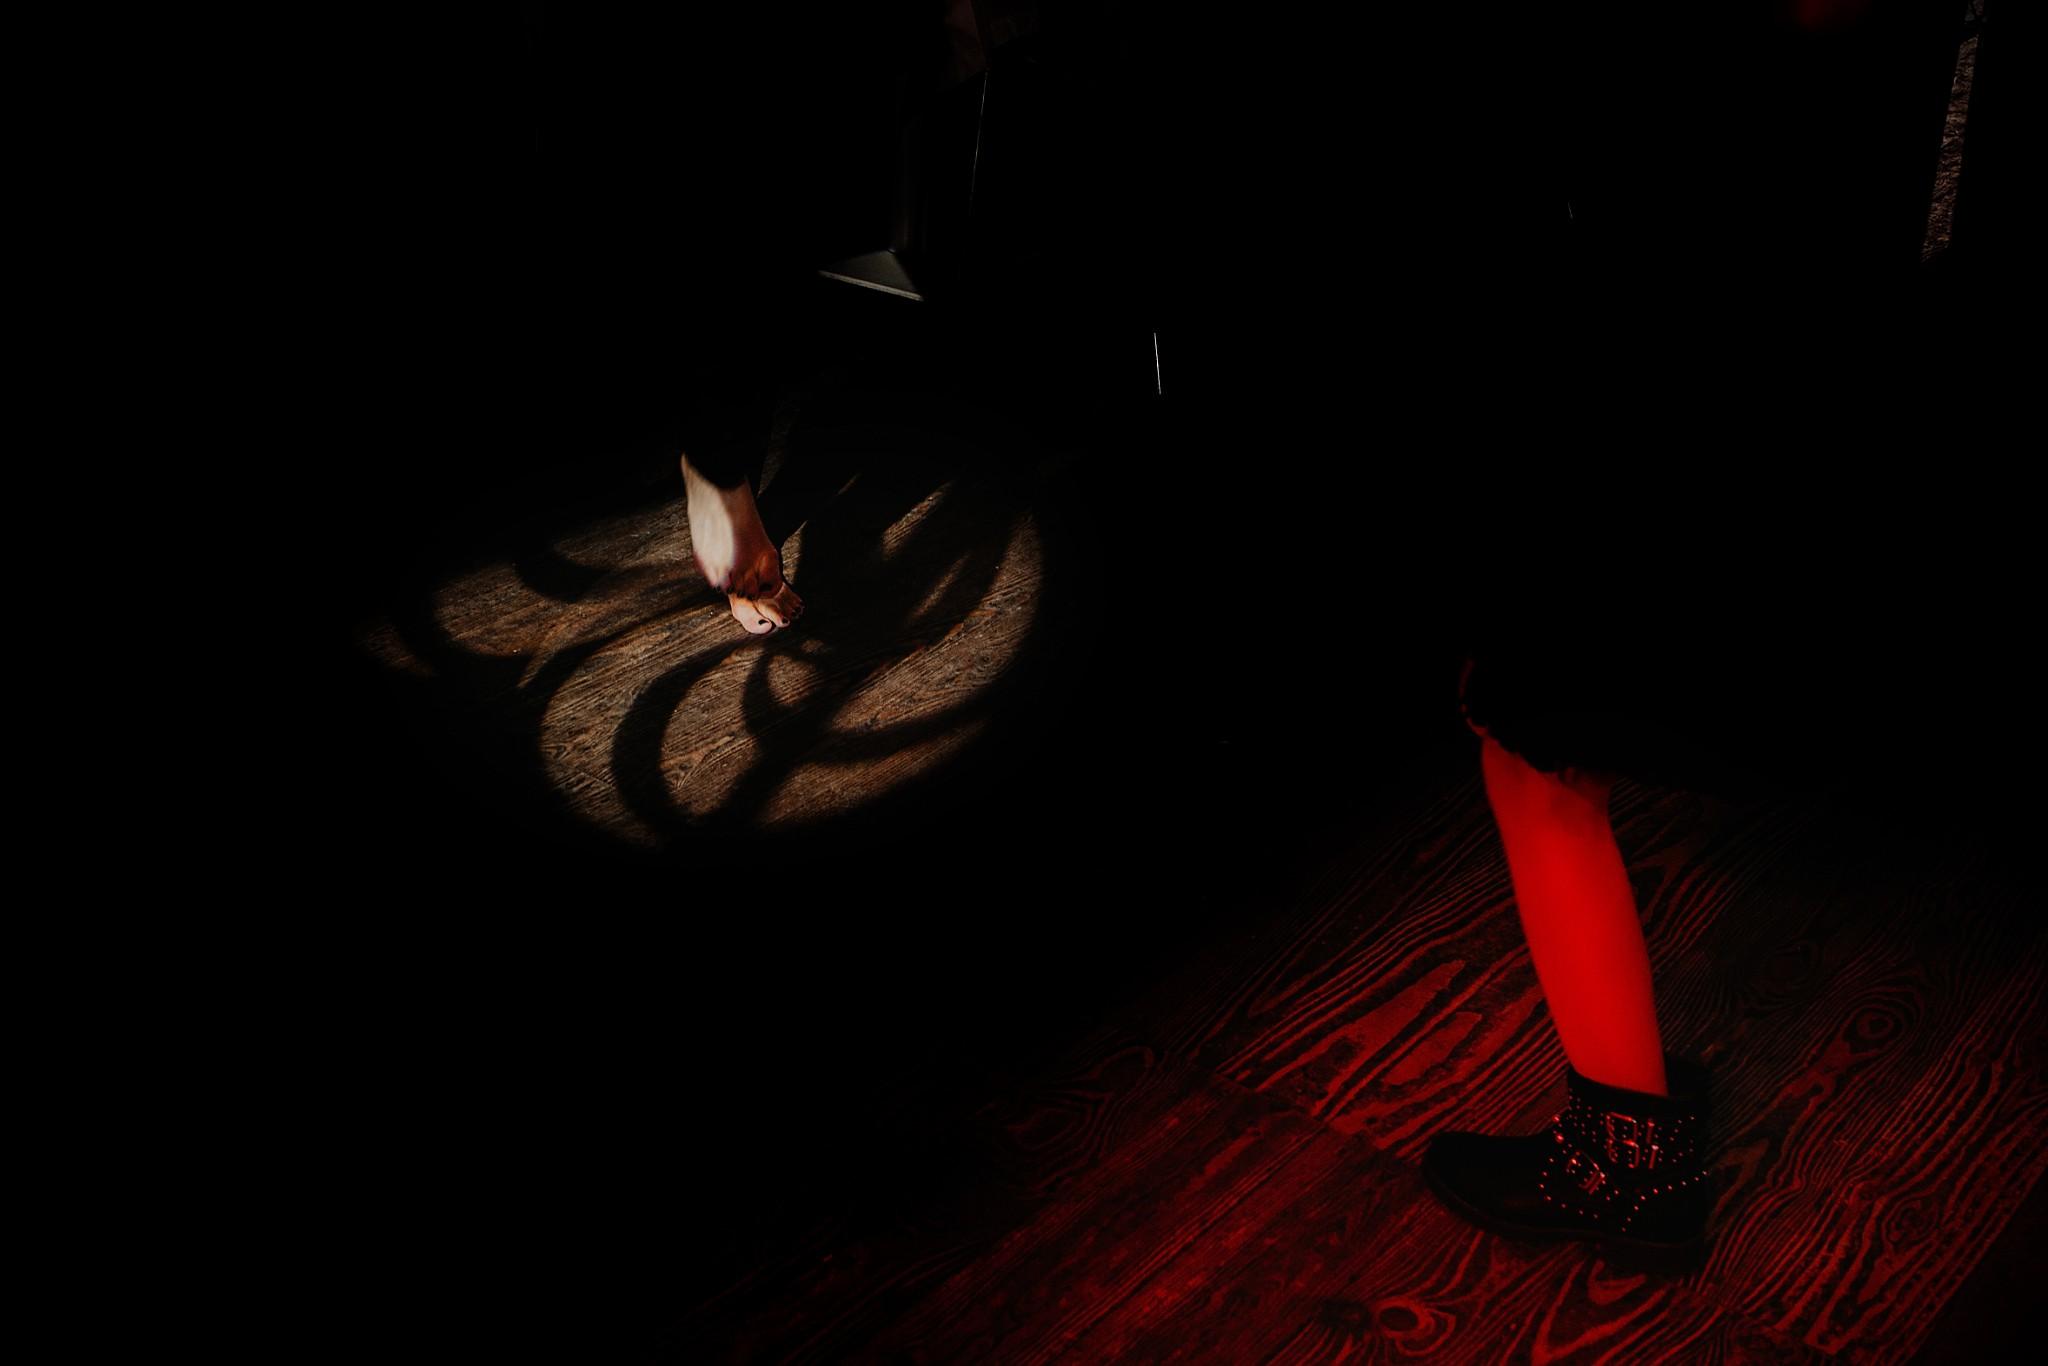 fotograf poznan wesele dobra truskawka piekne wesele pod poznaniem wesele w dobrej truskawce piekna para mloda slub marzen slub koronawirus slub listopad wesele koronawirus 412